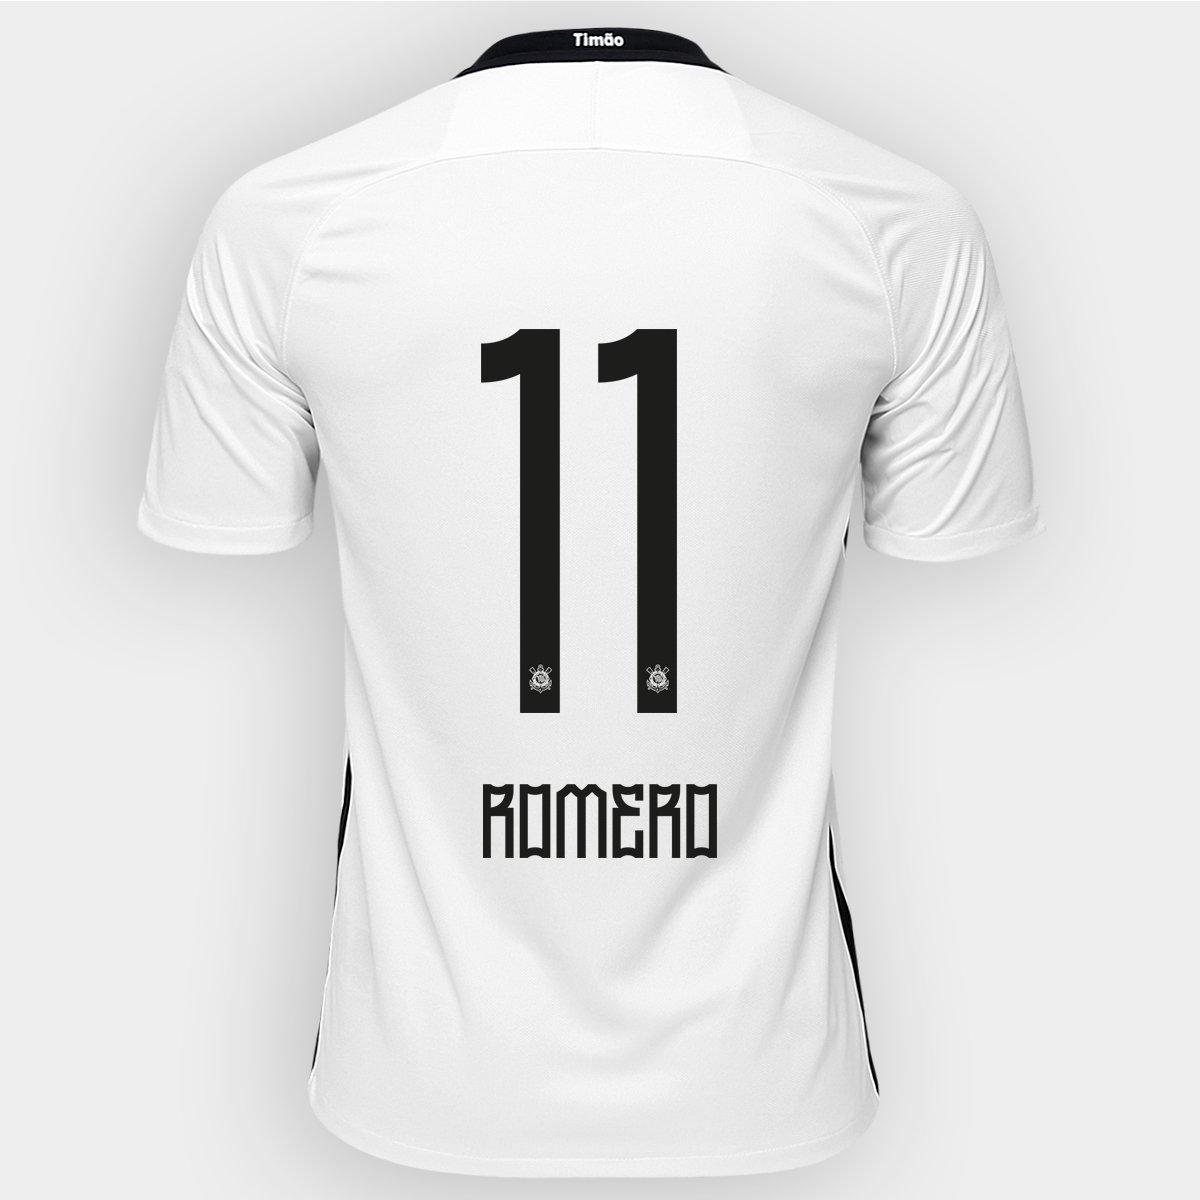 Camisa Nike Corinthians I 2016 nº 11 - Romero - Compre Agora  79870cf521f5c